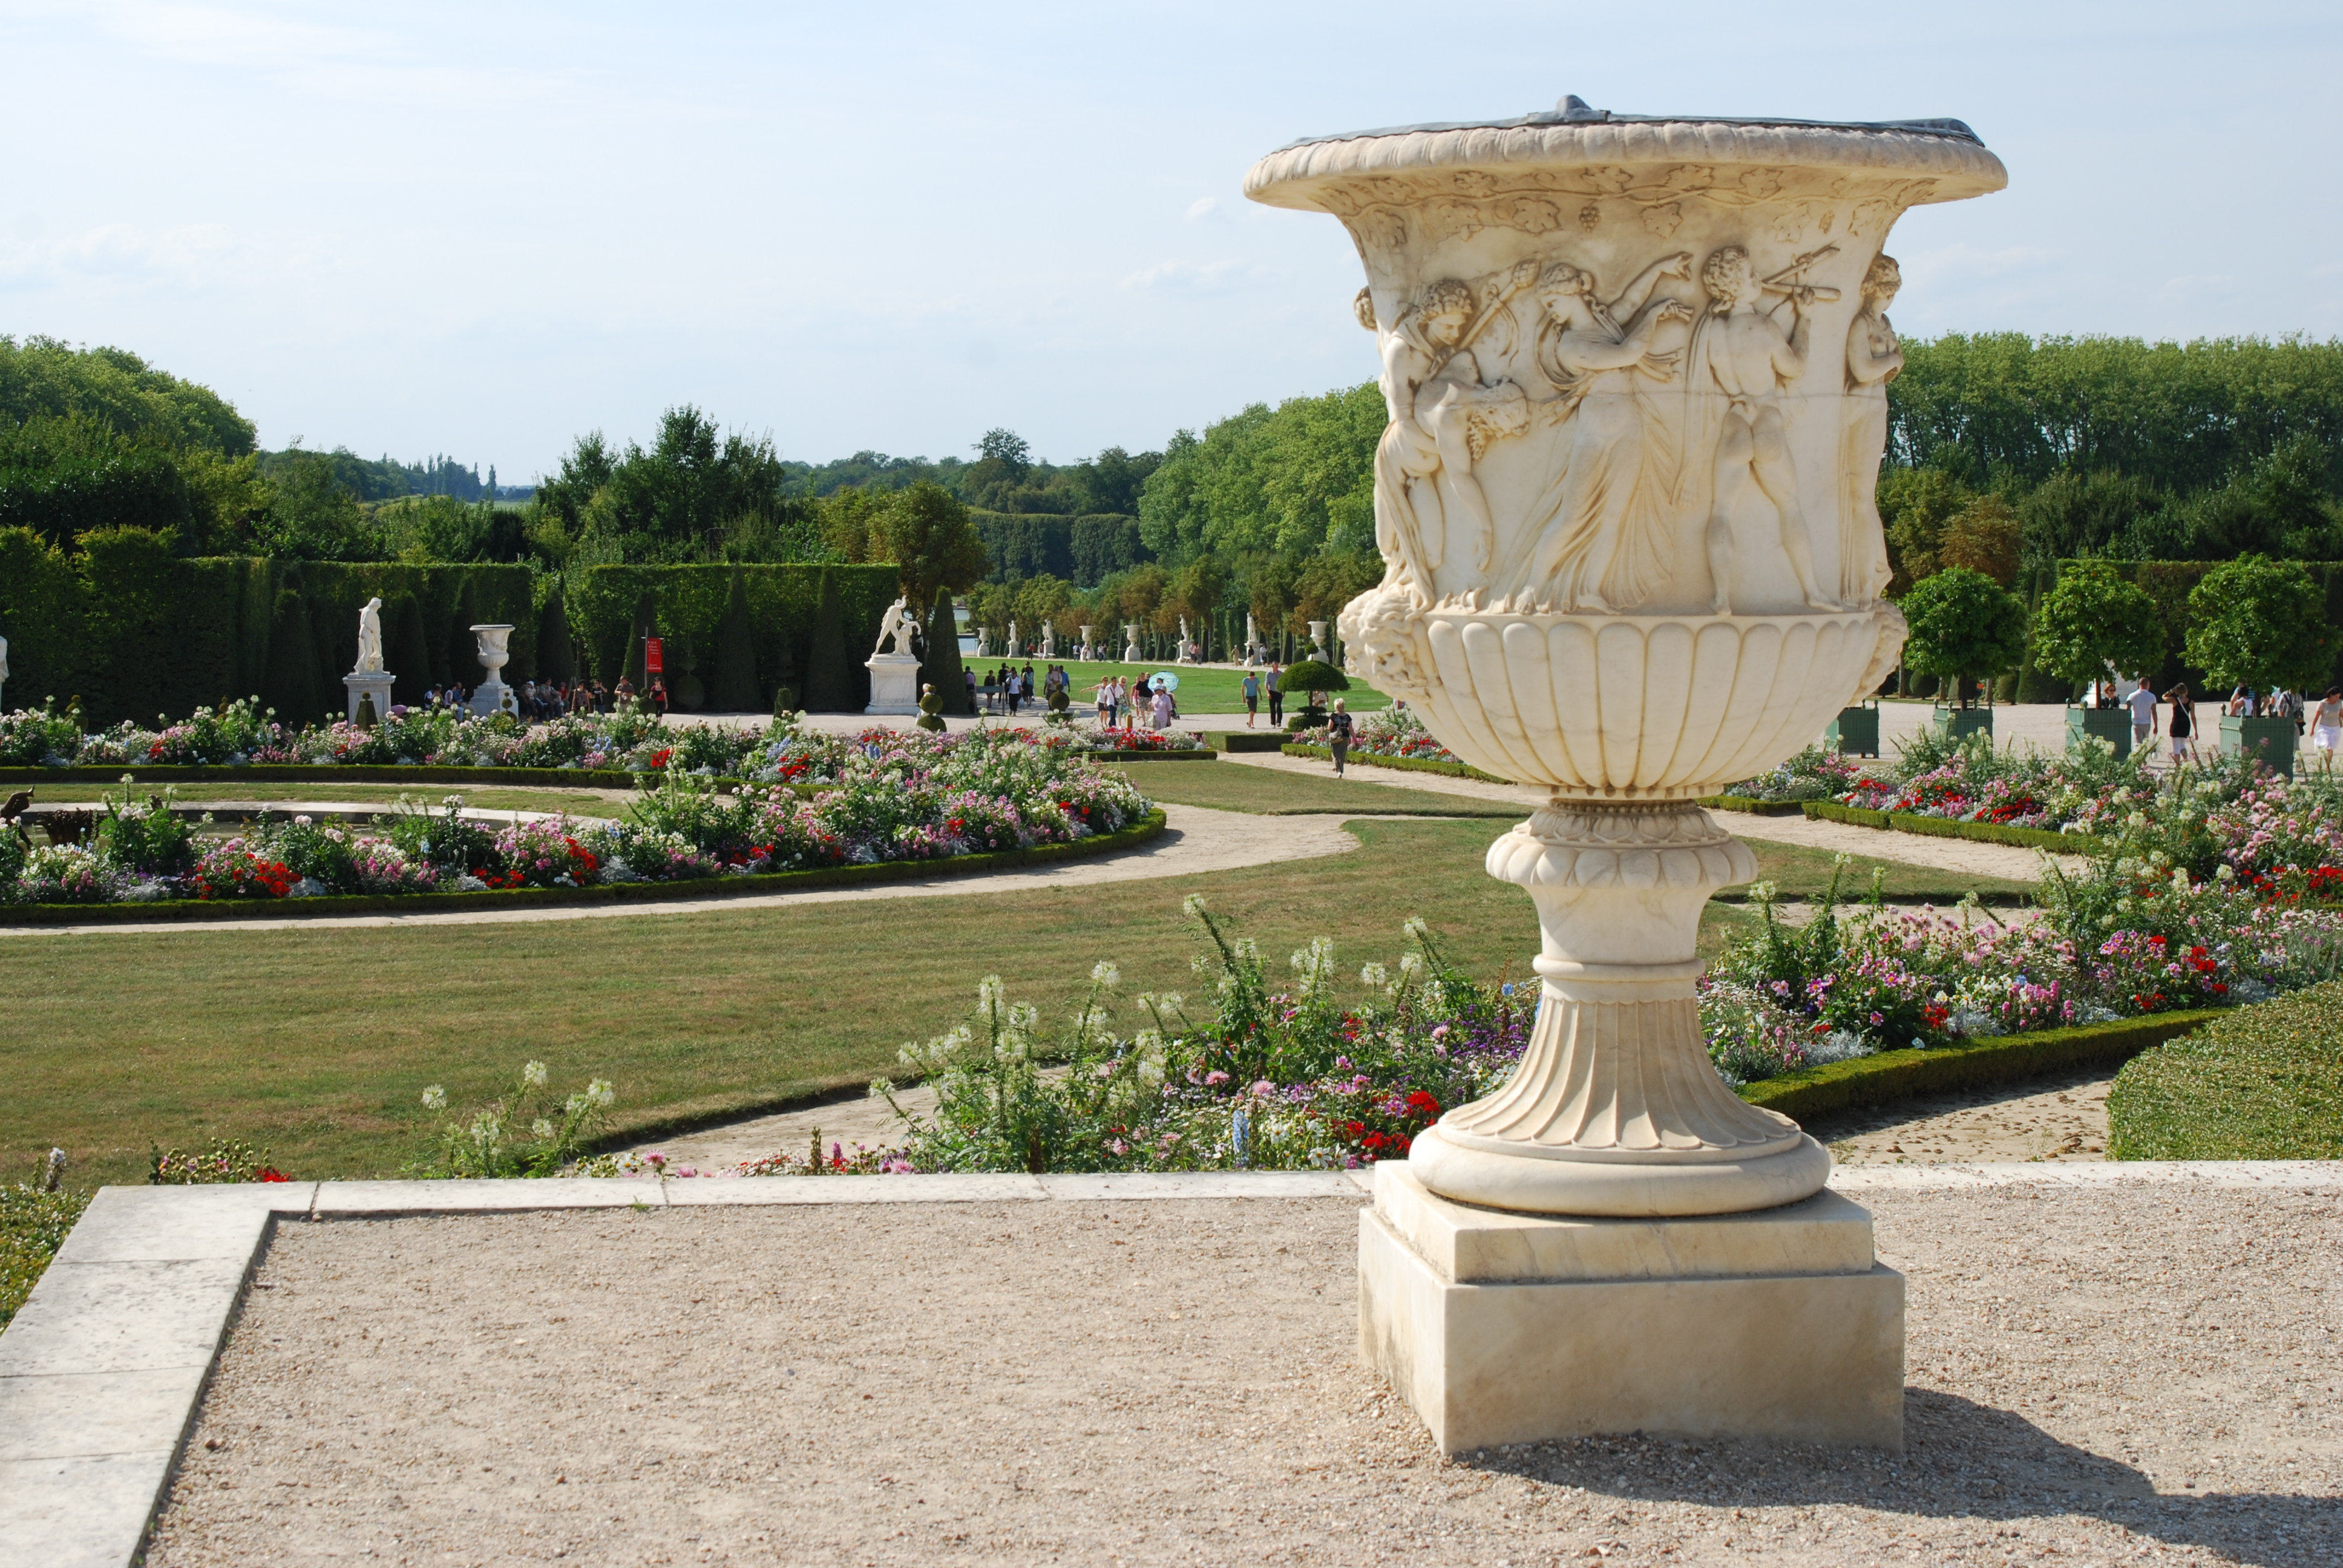 Jardins de versailles vase de pierre andr le n tre for Jardin versailles